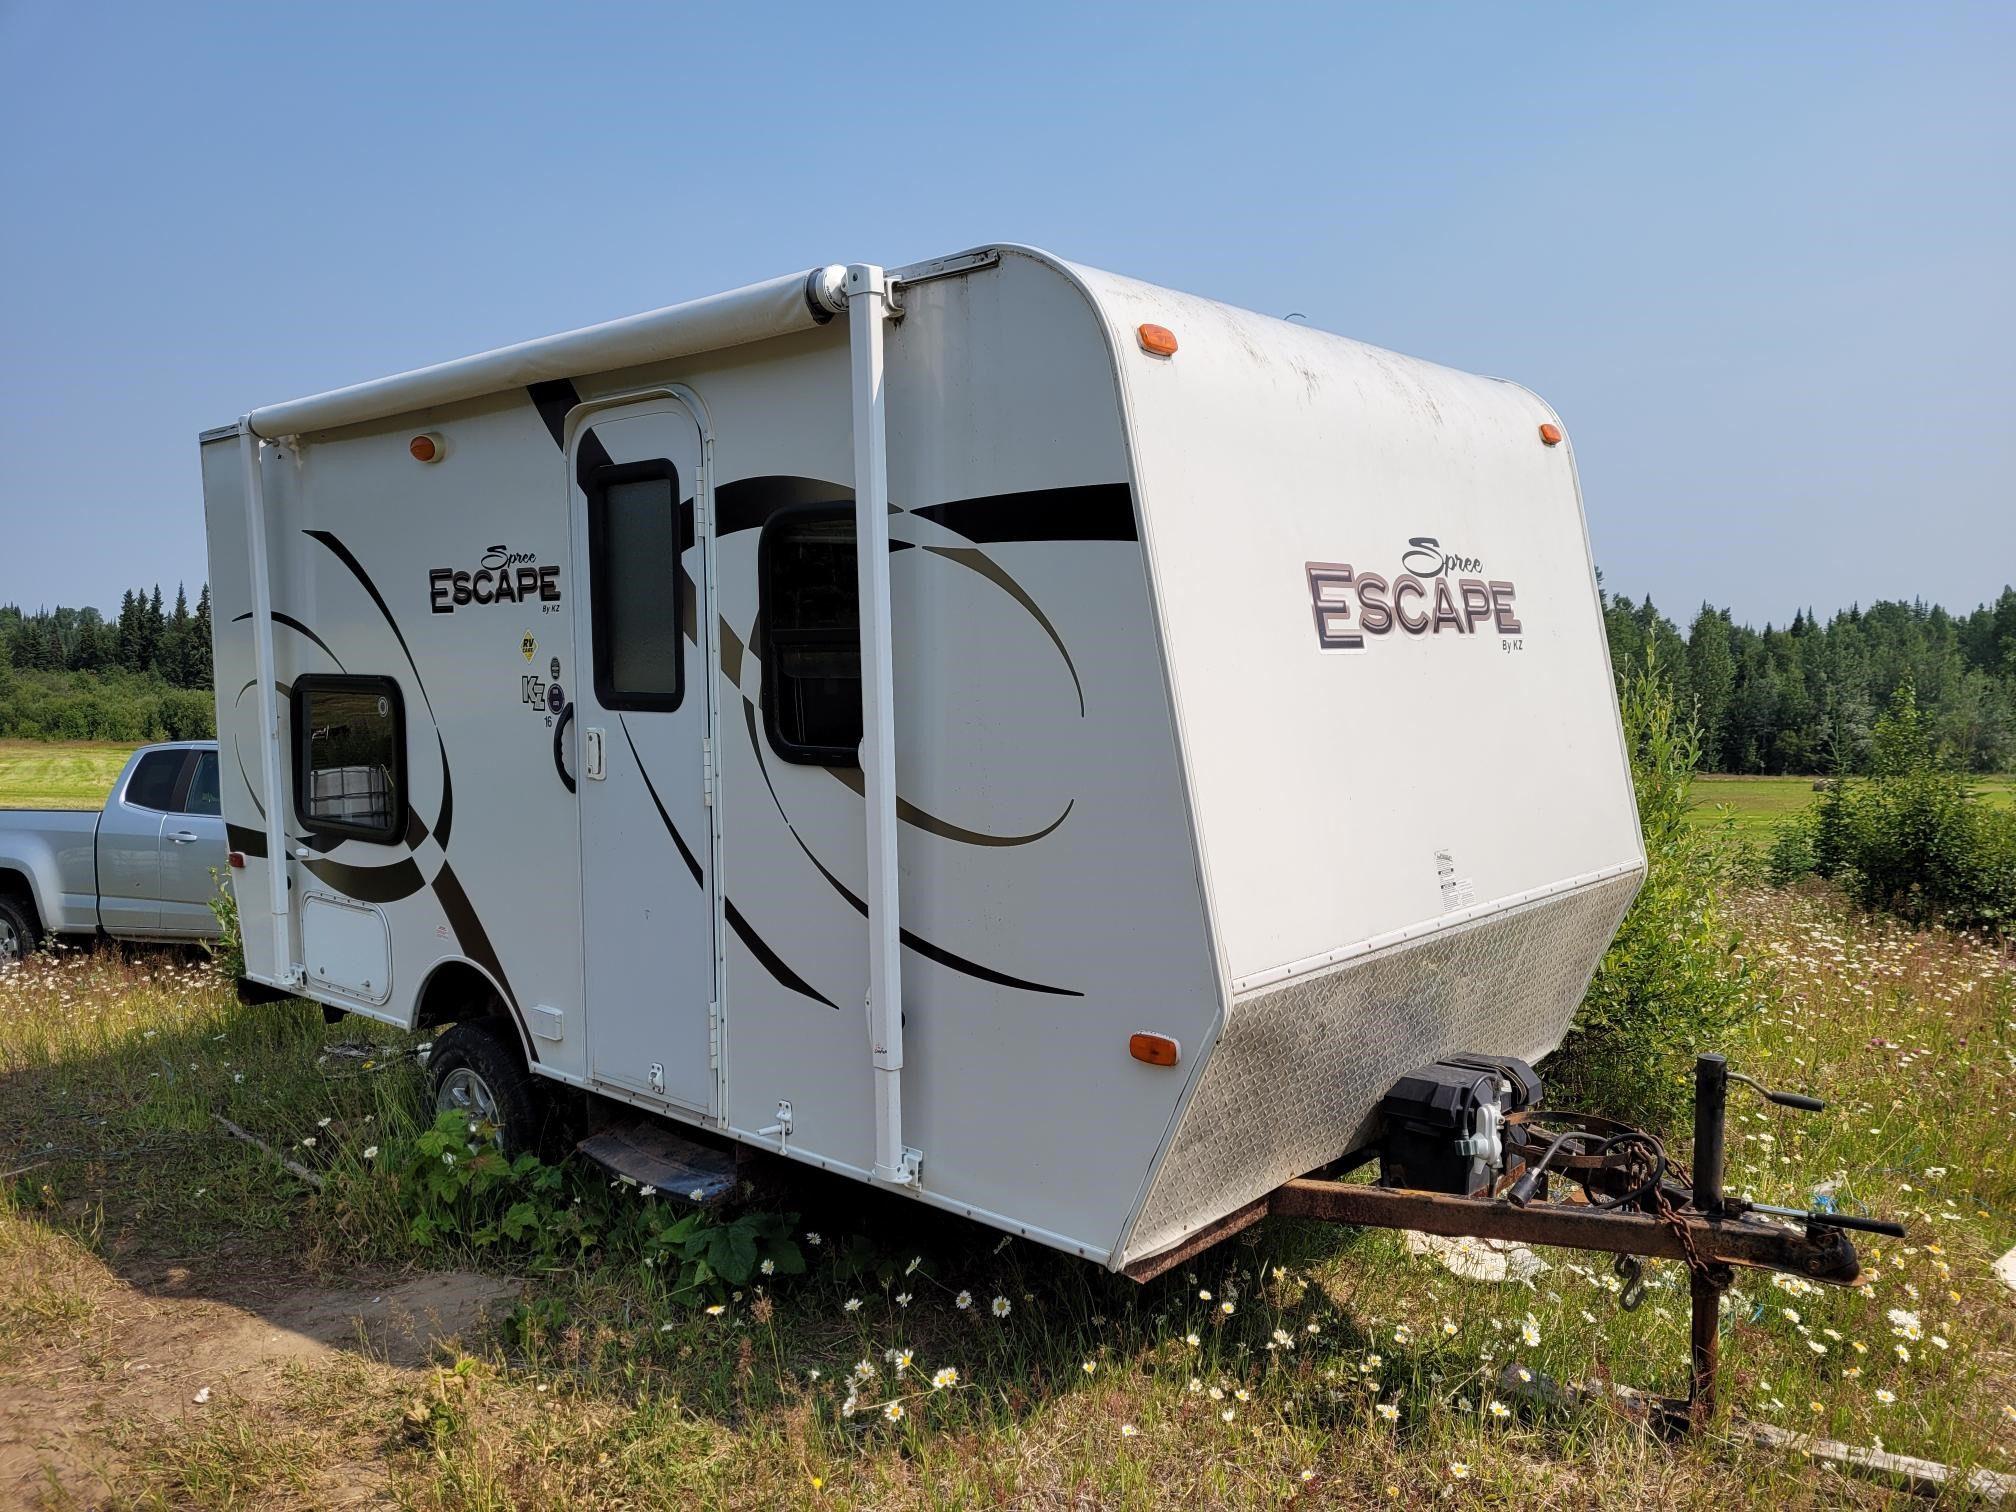 2011 Spree Escape Sportsman #B-PG-0471 Located in Prince George